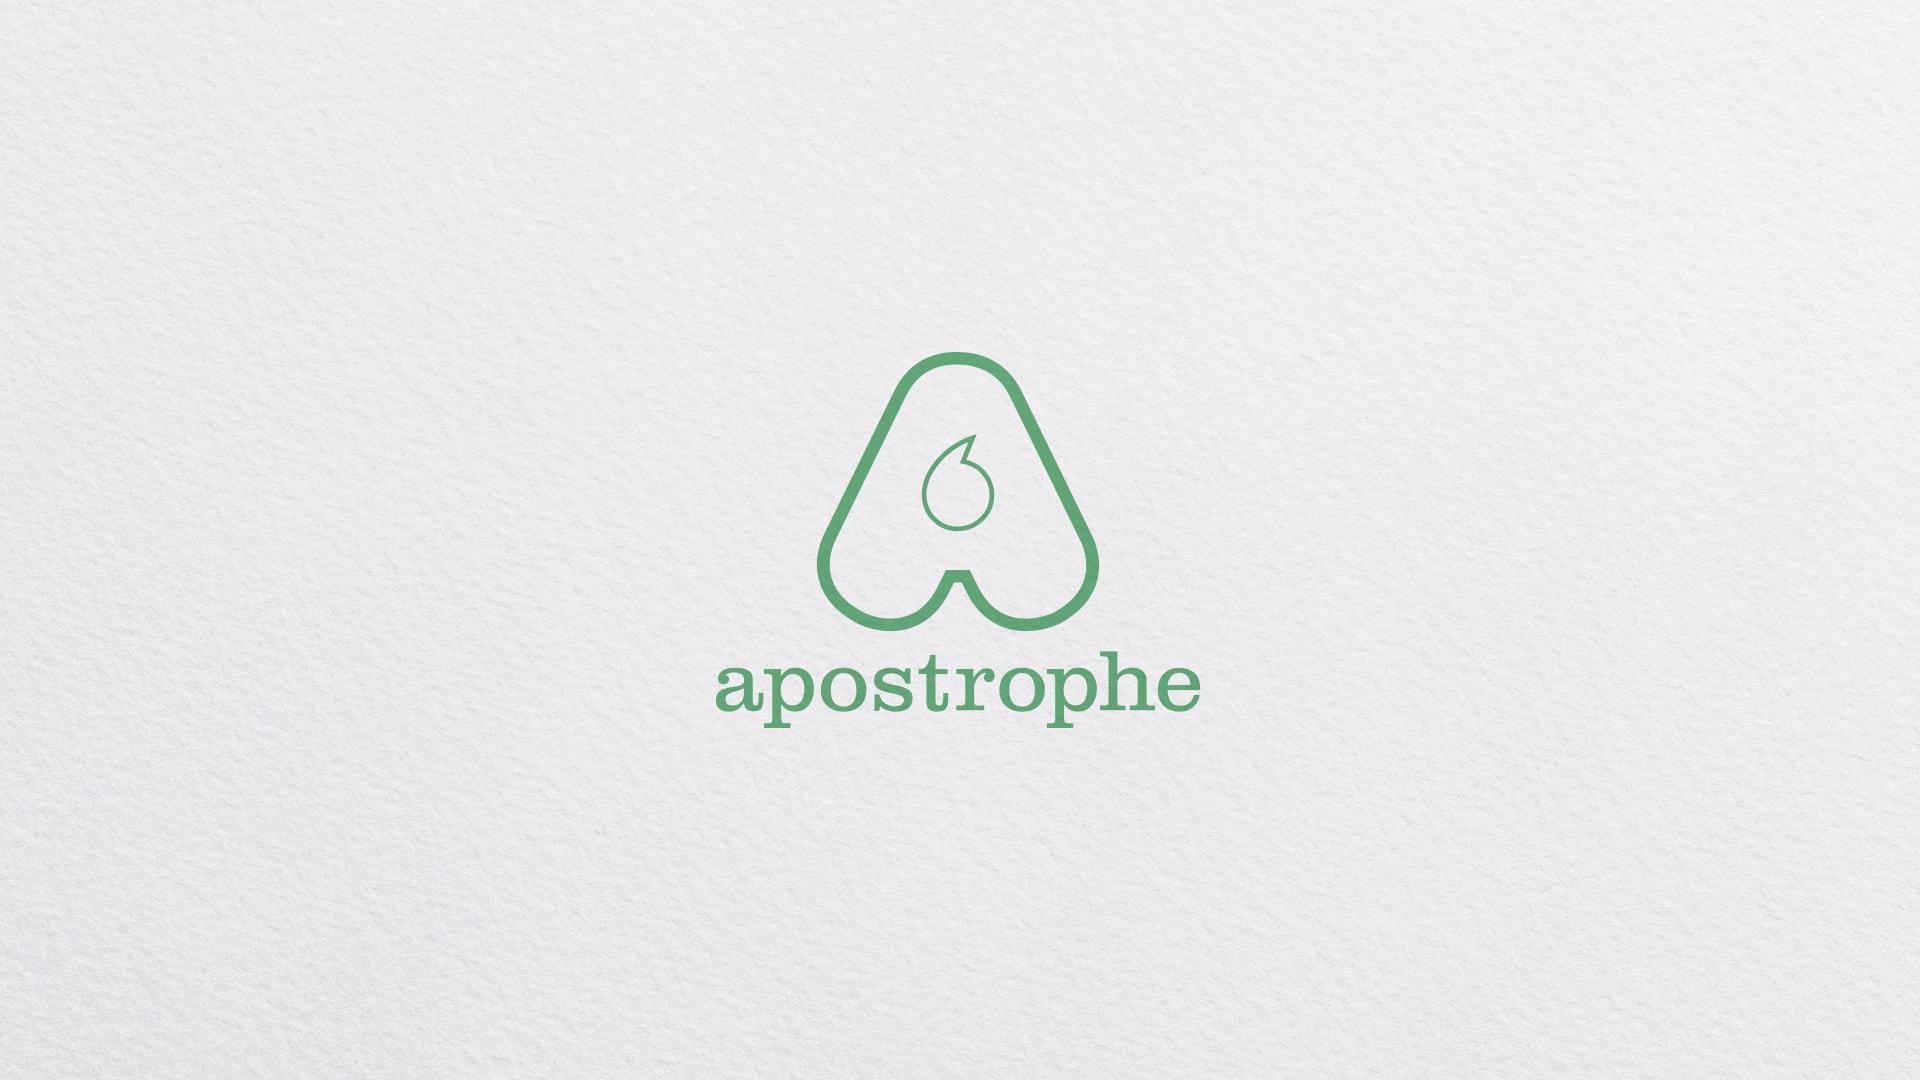 apostrophe logo design